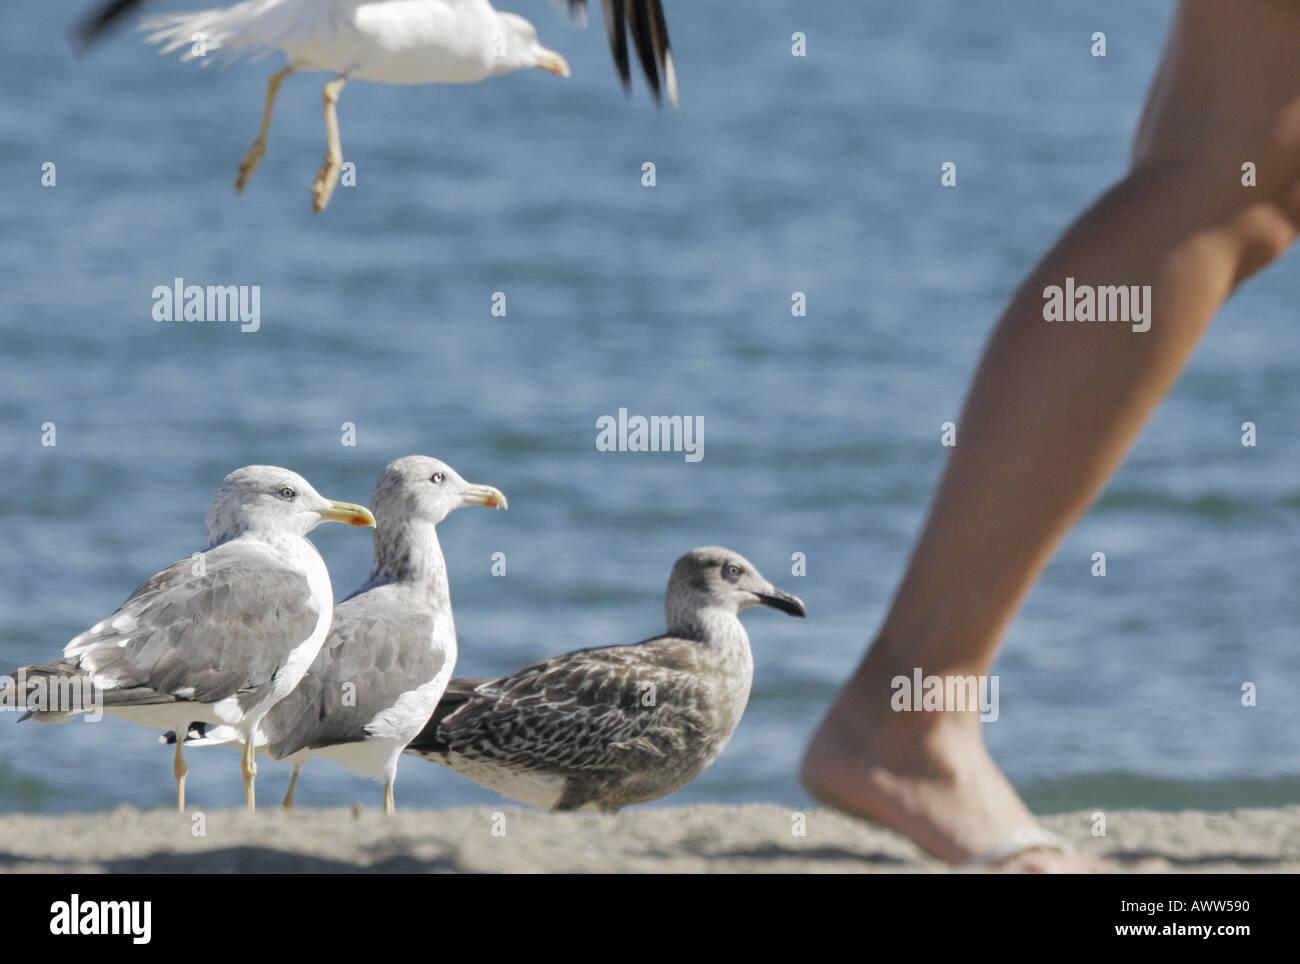 Seagulls looking at person walking - Stock Image